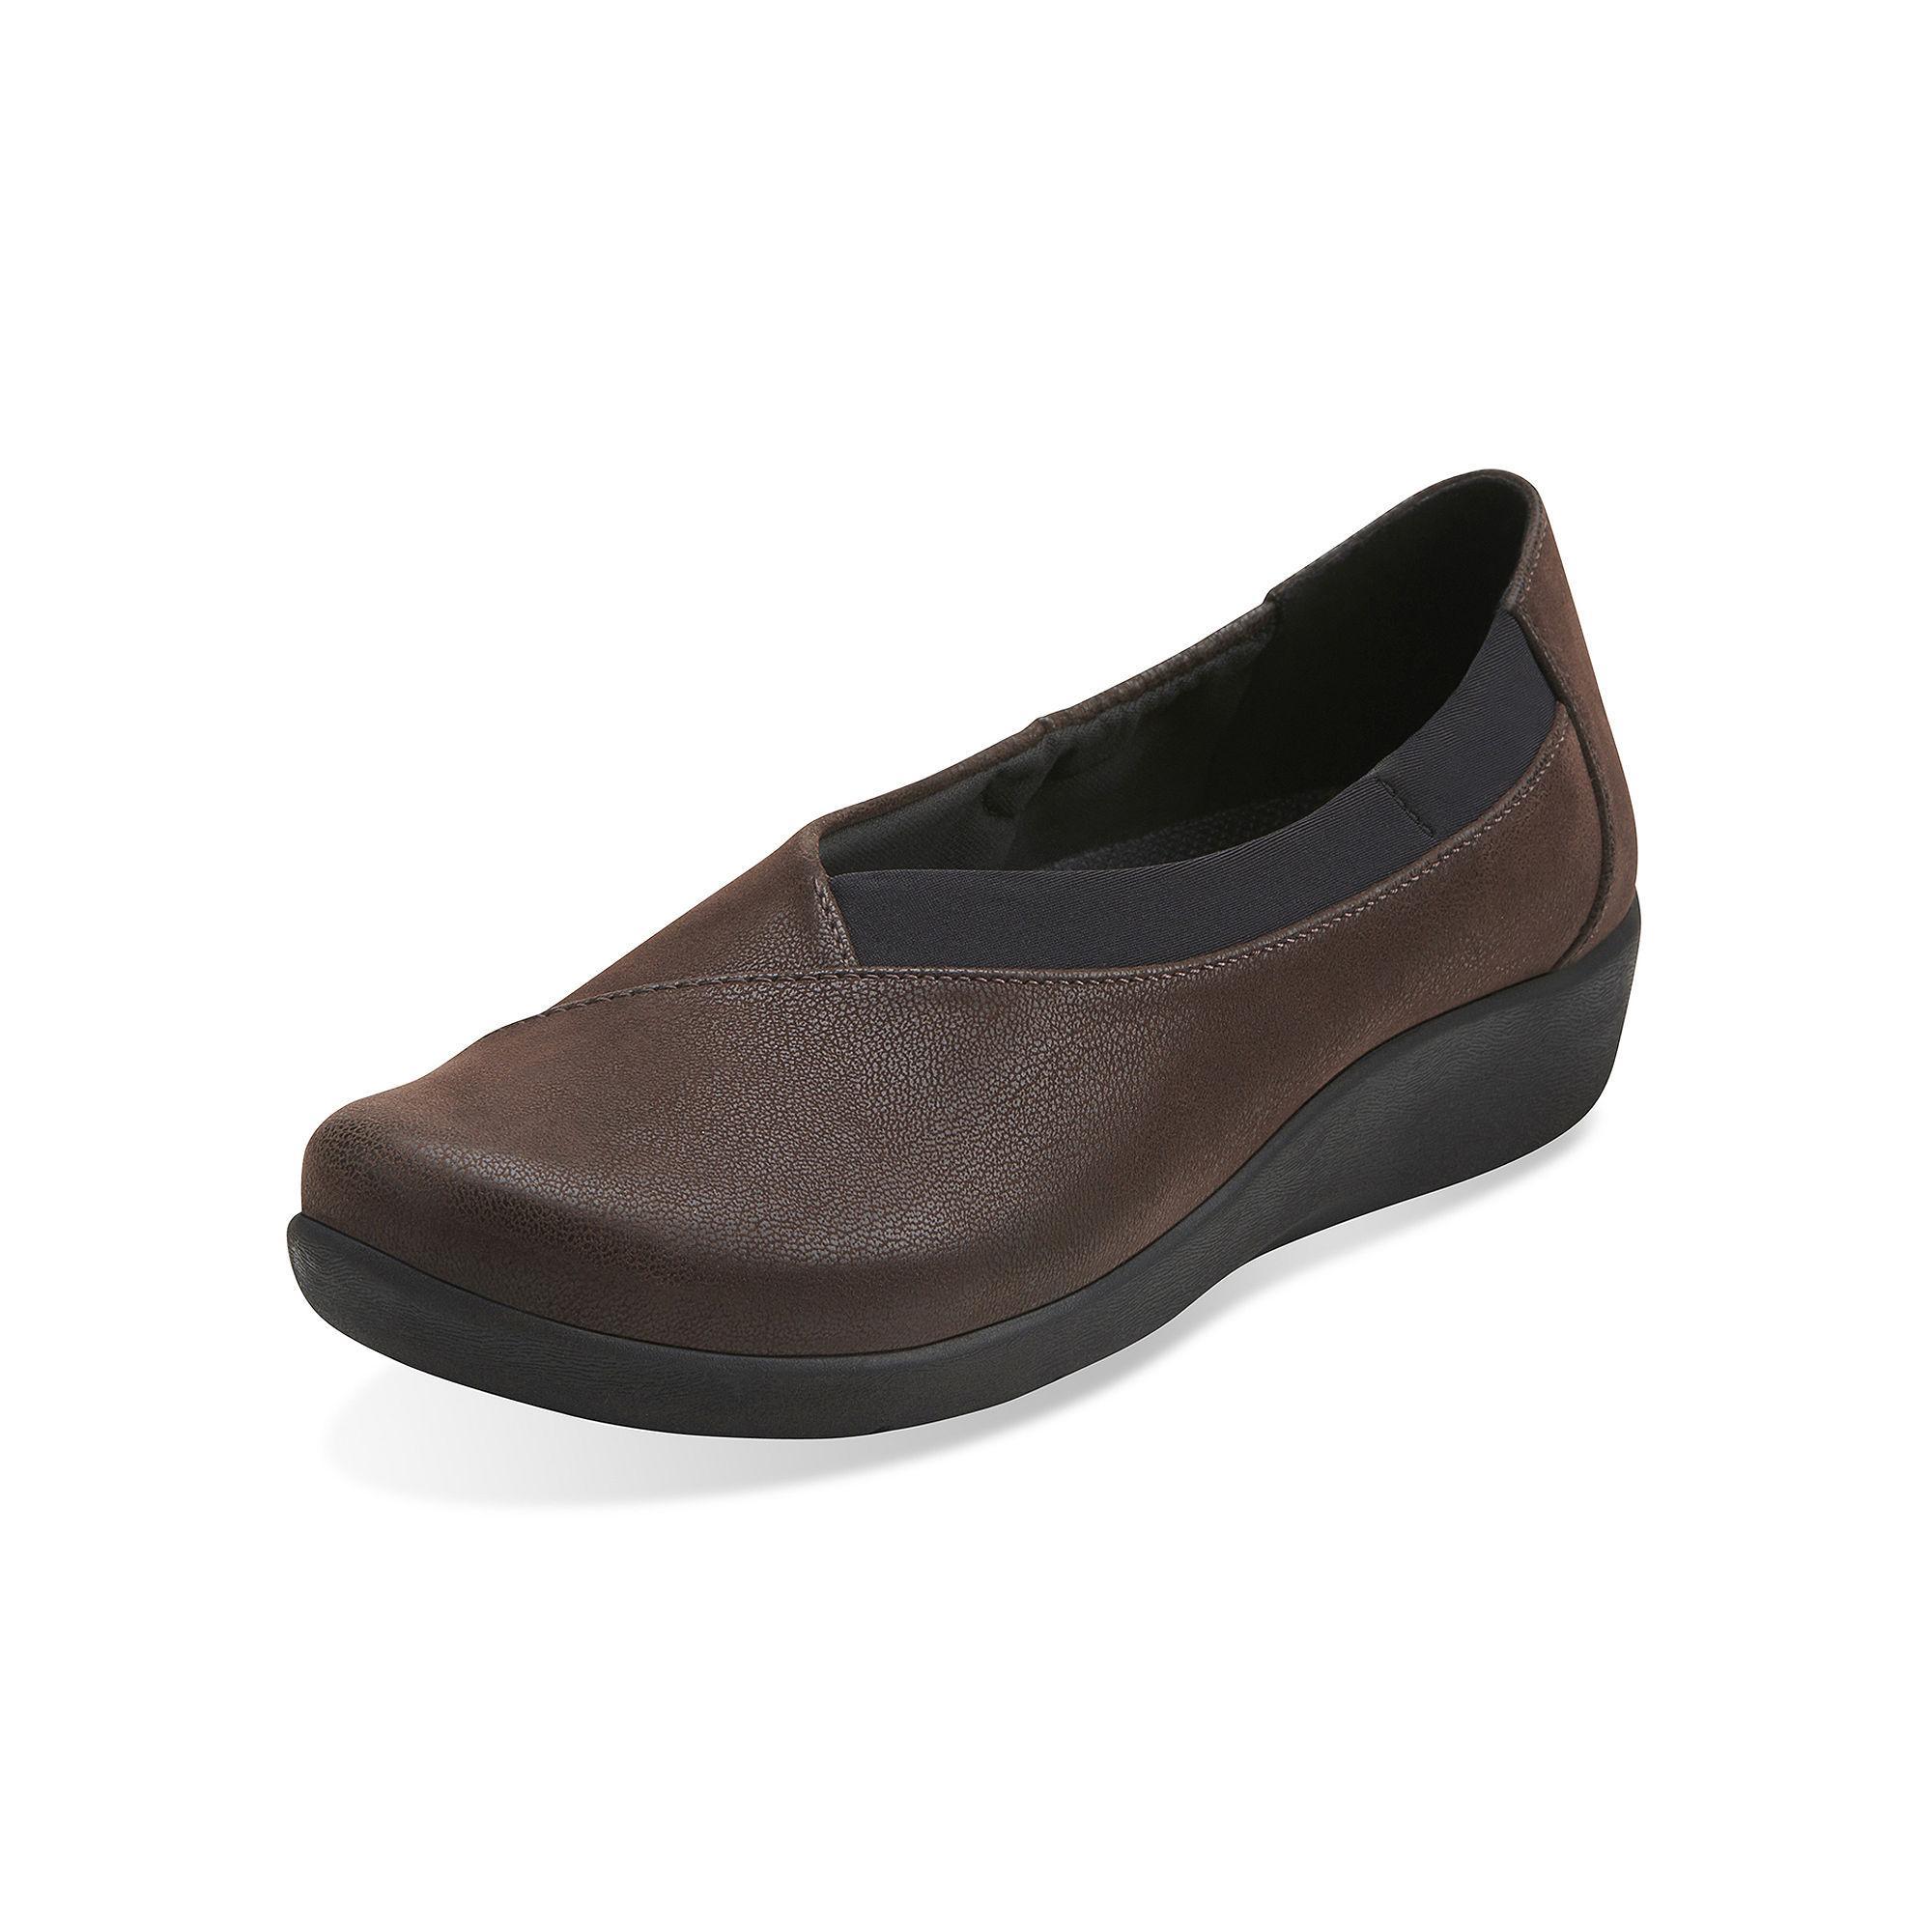 Clarks Sillian Jetay Nubuck Slip-On Shoes